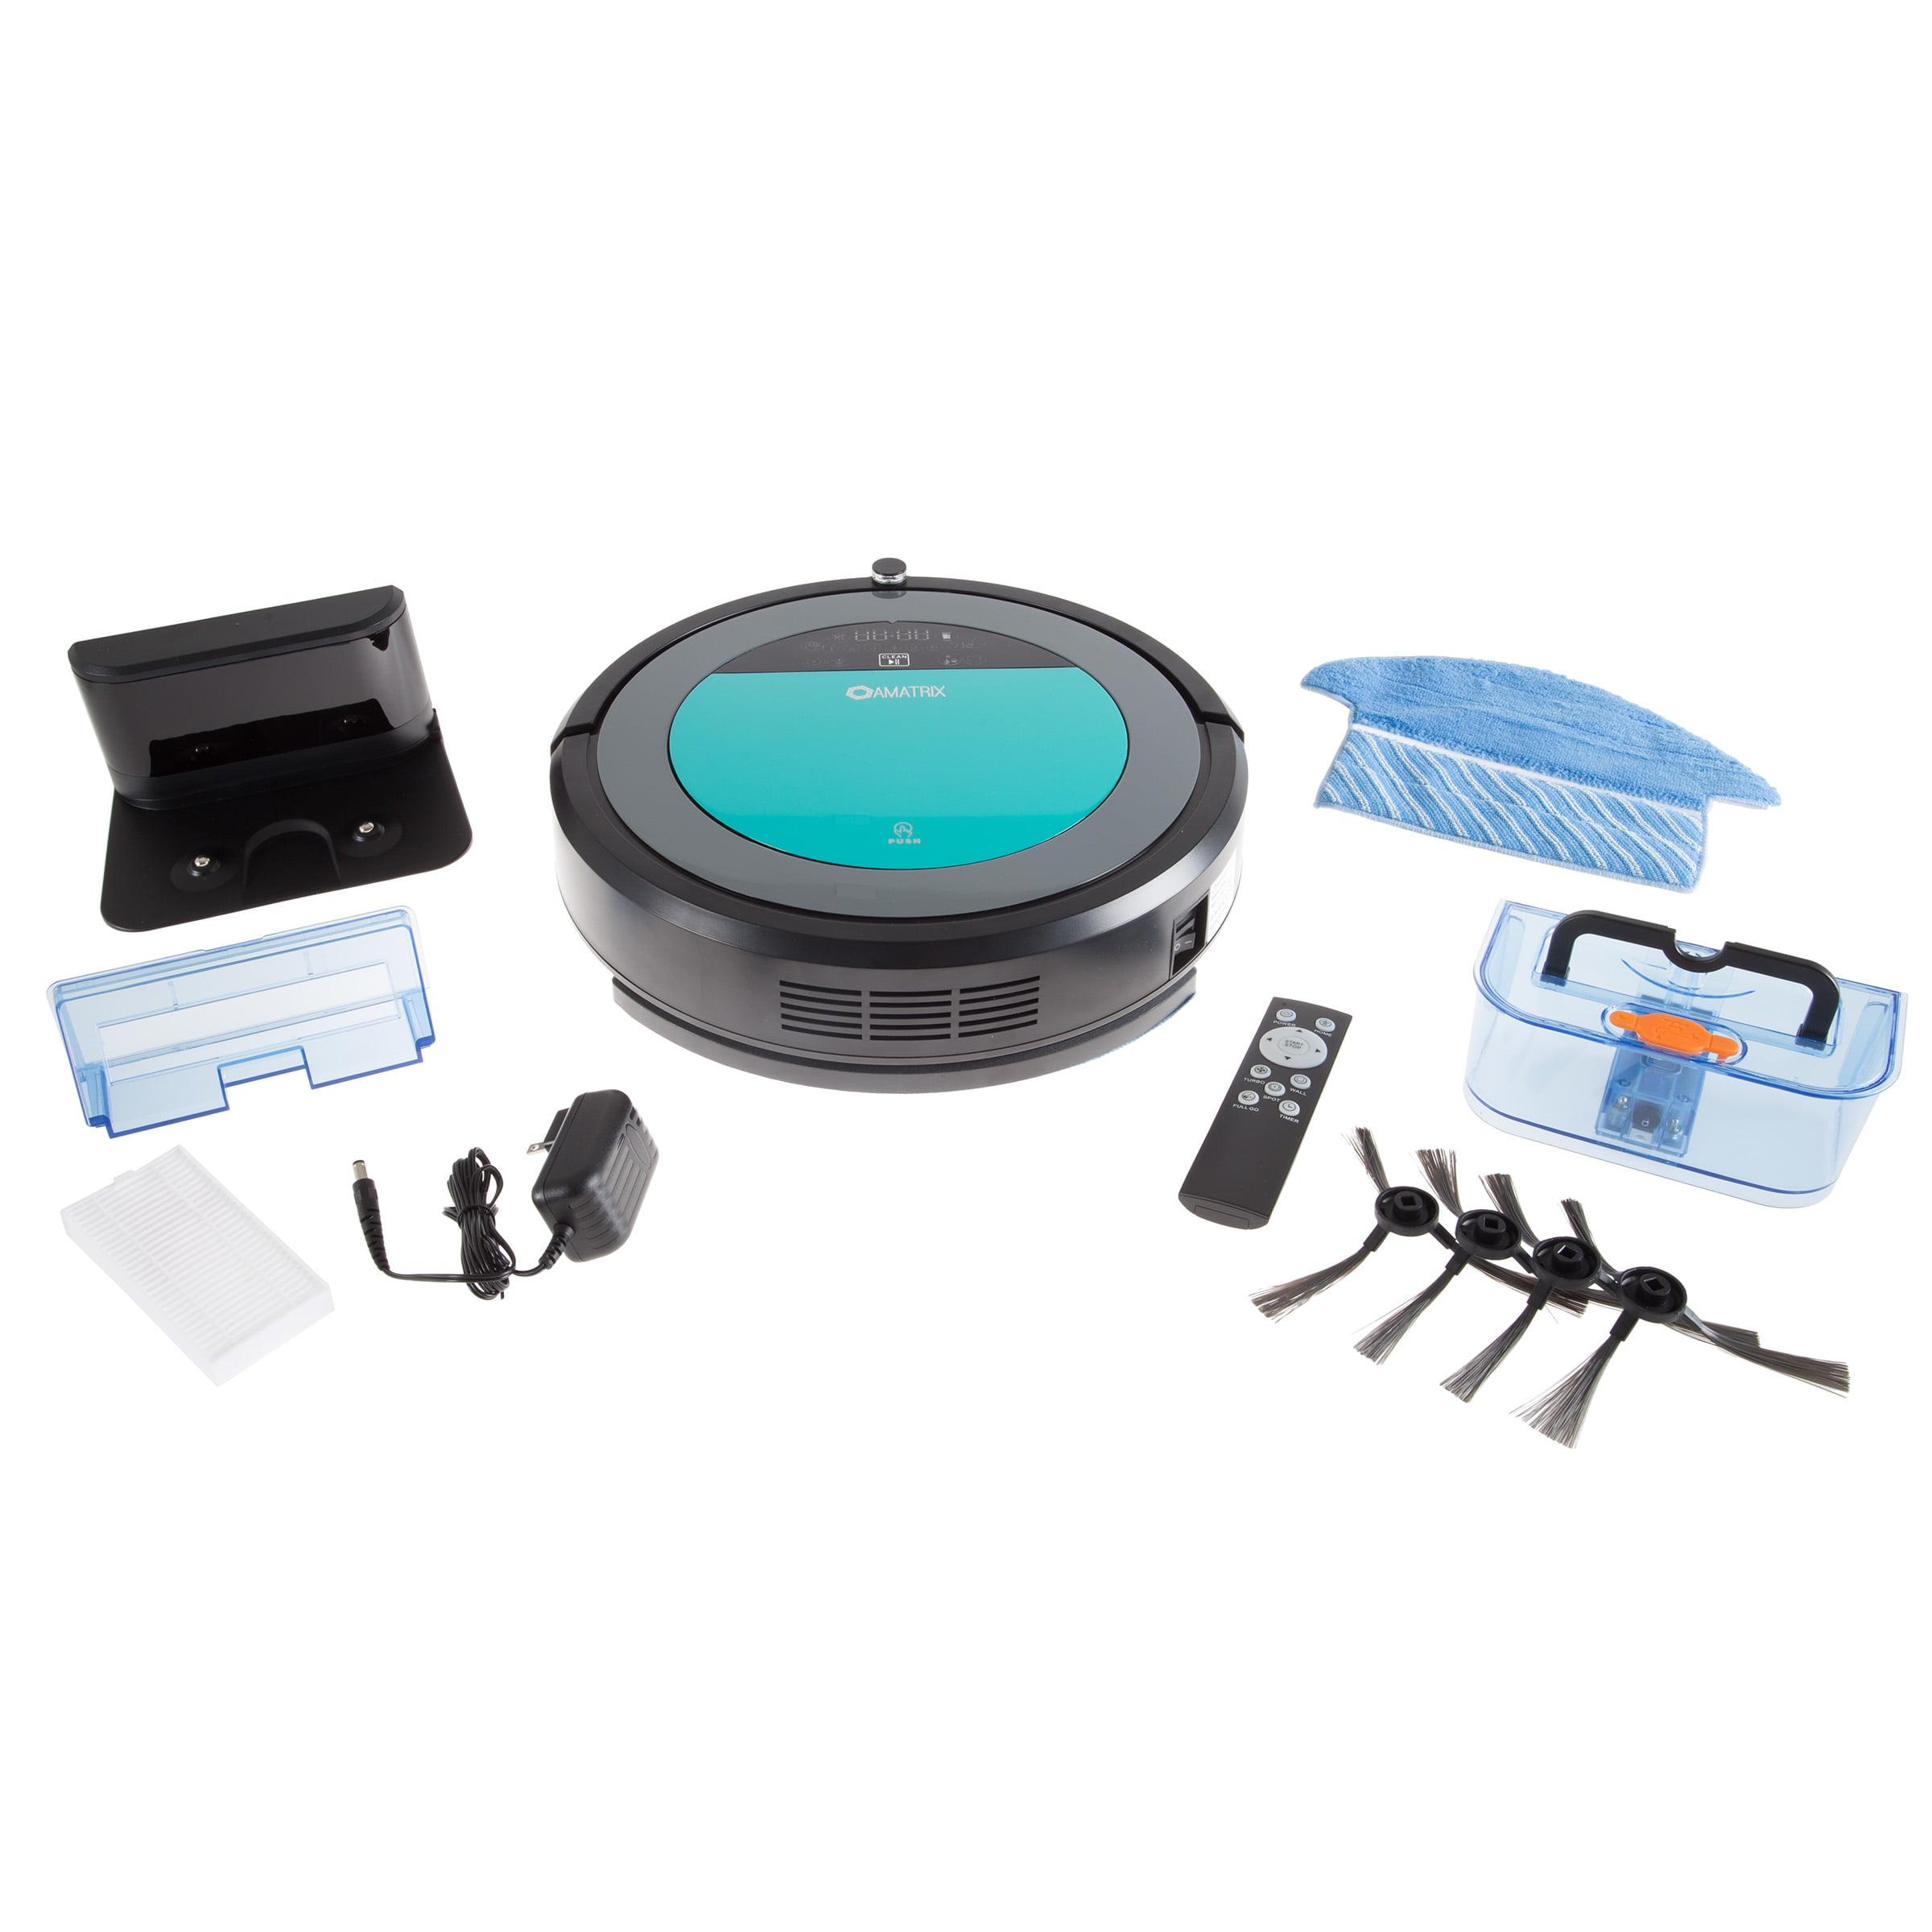 Amatrix V600 Robotic Vacuum and Mop Programmable Cleaner Carpets Wood Floors